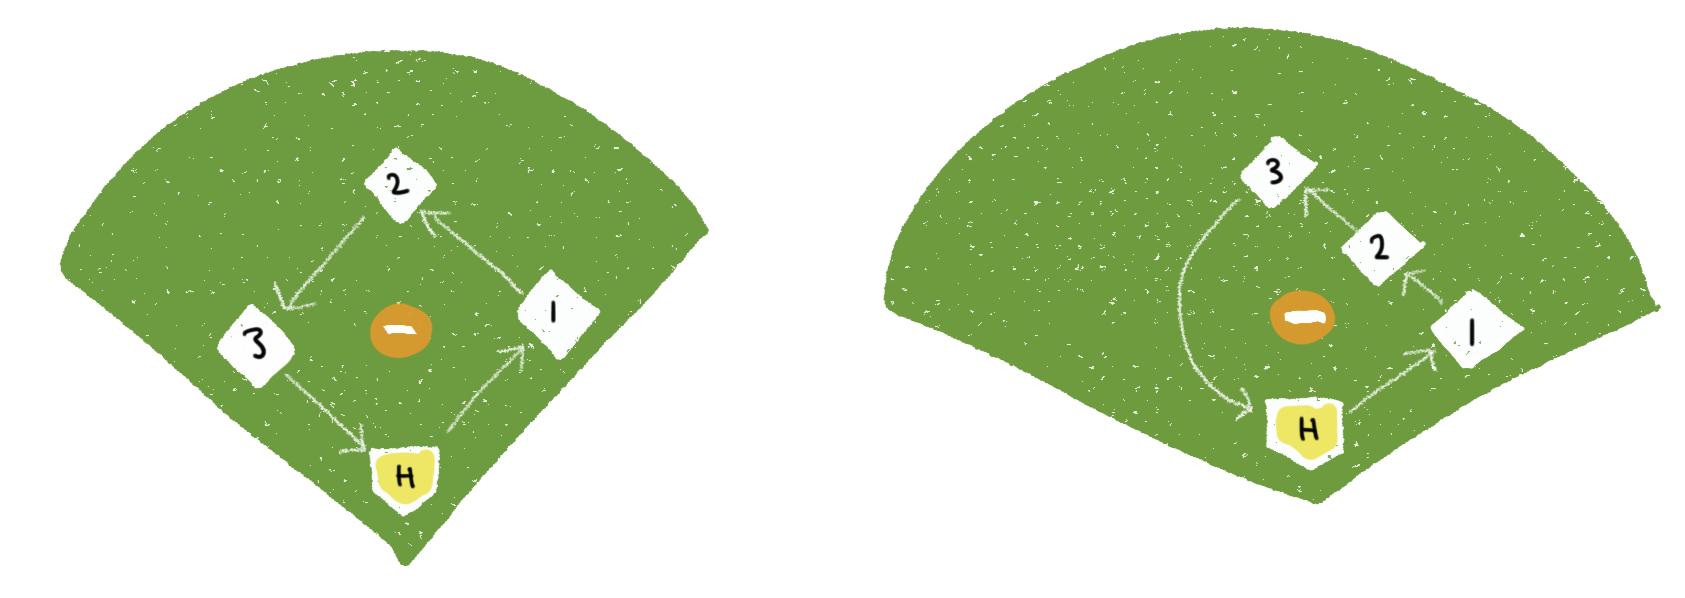 baseball-options-0-rearranged